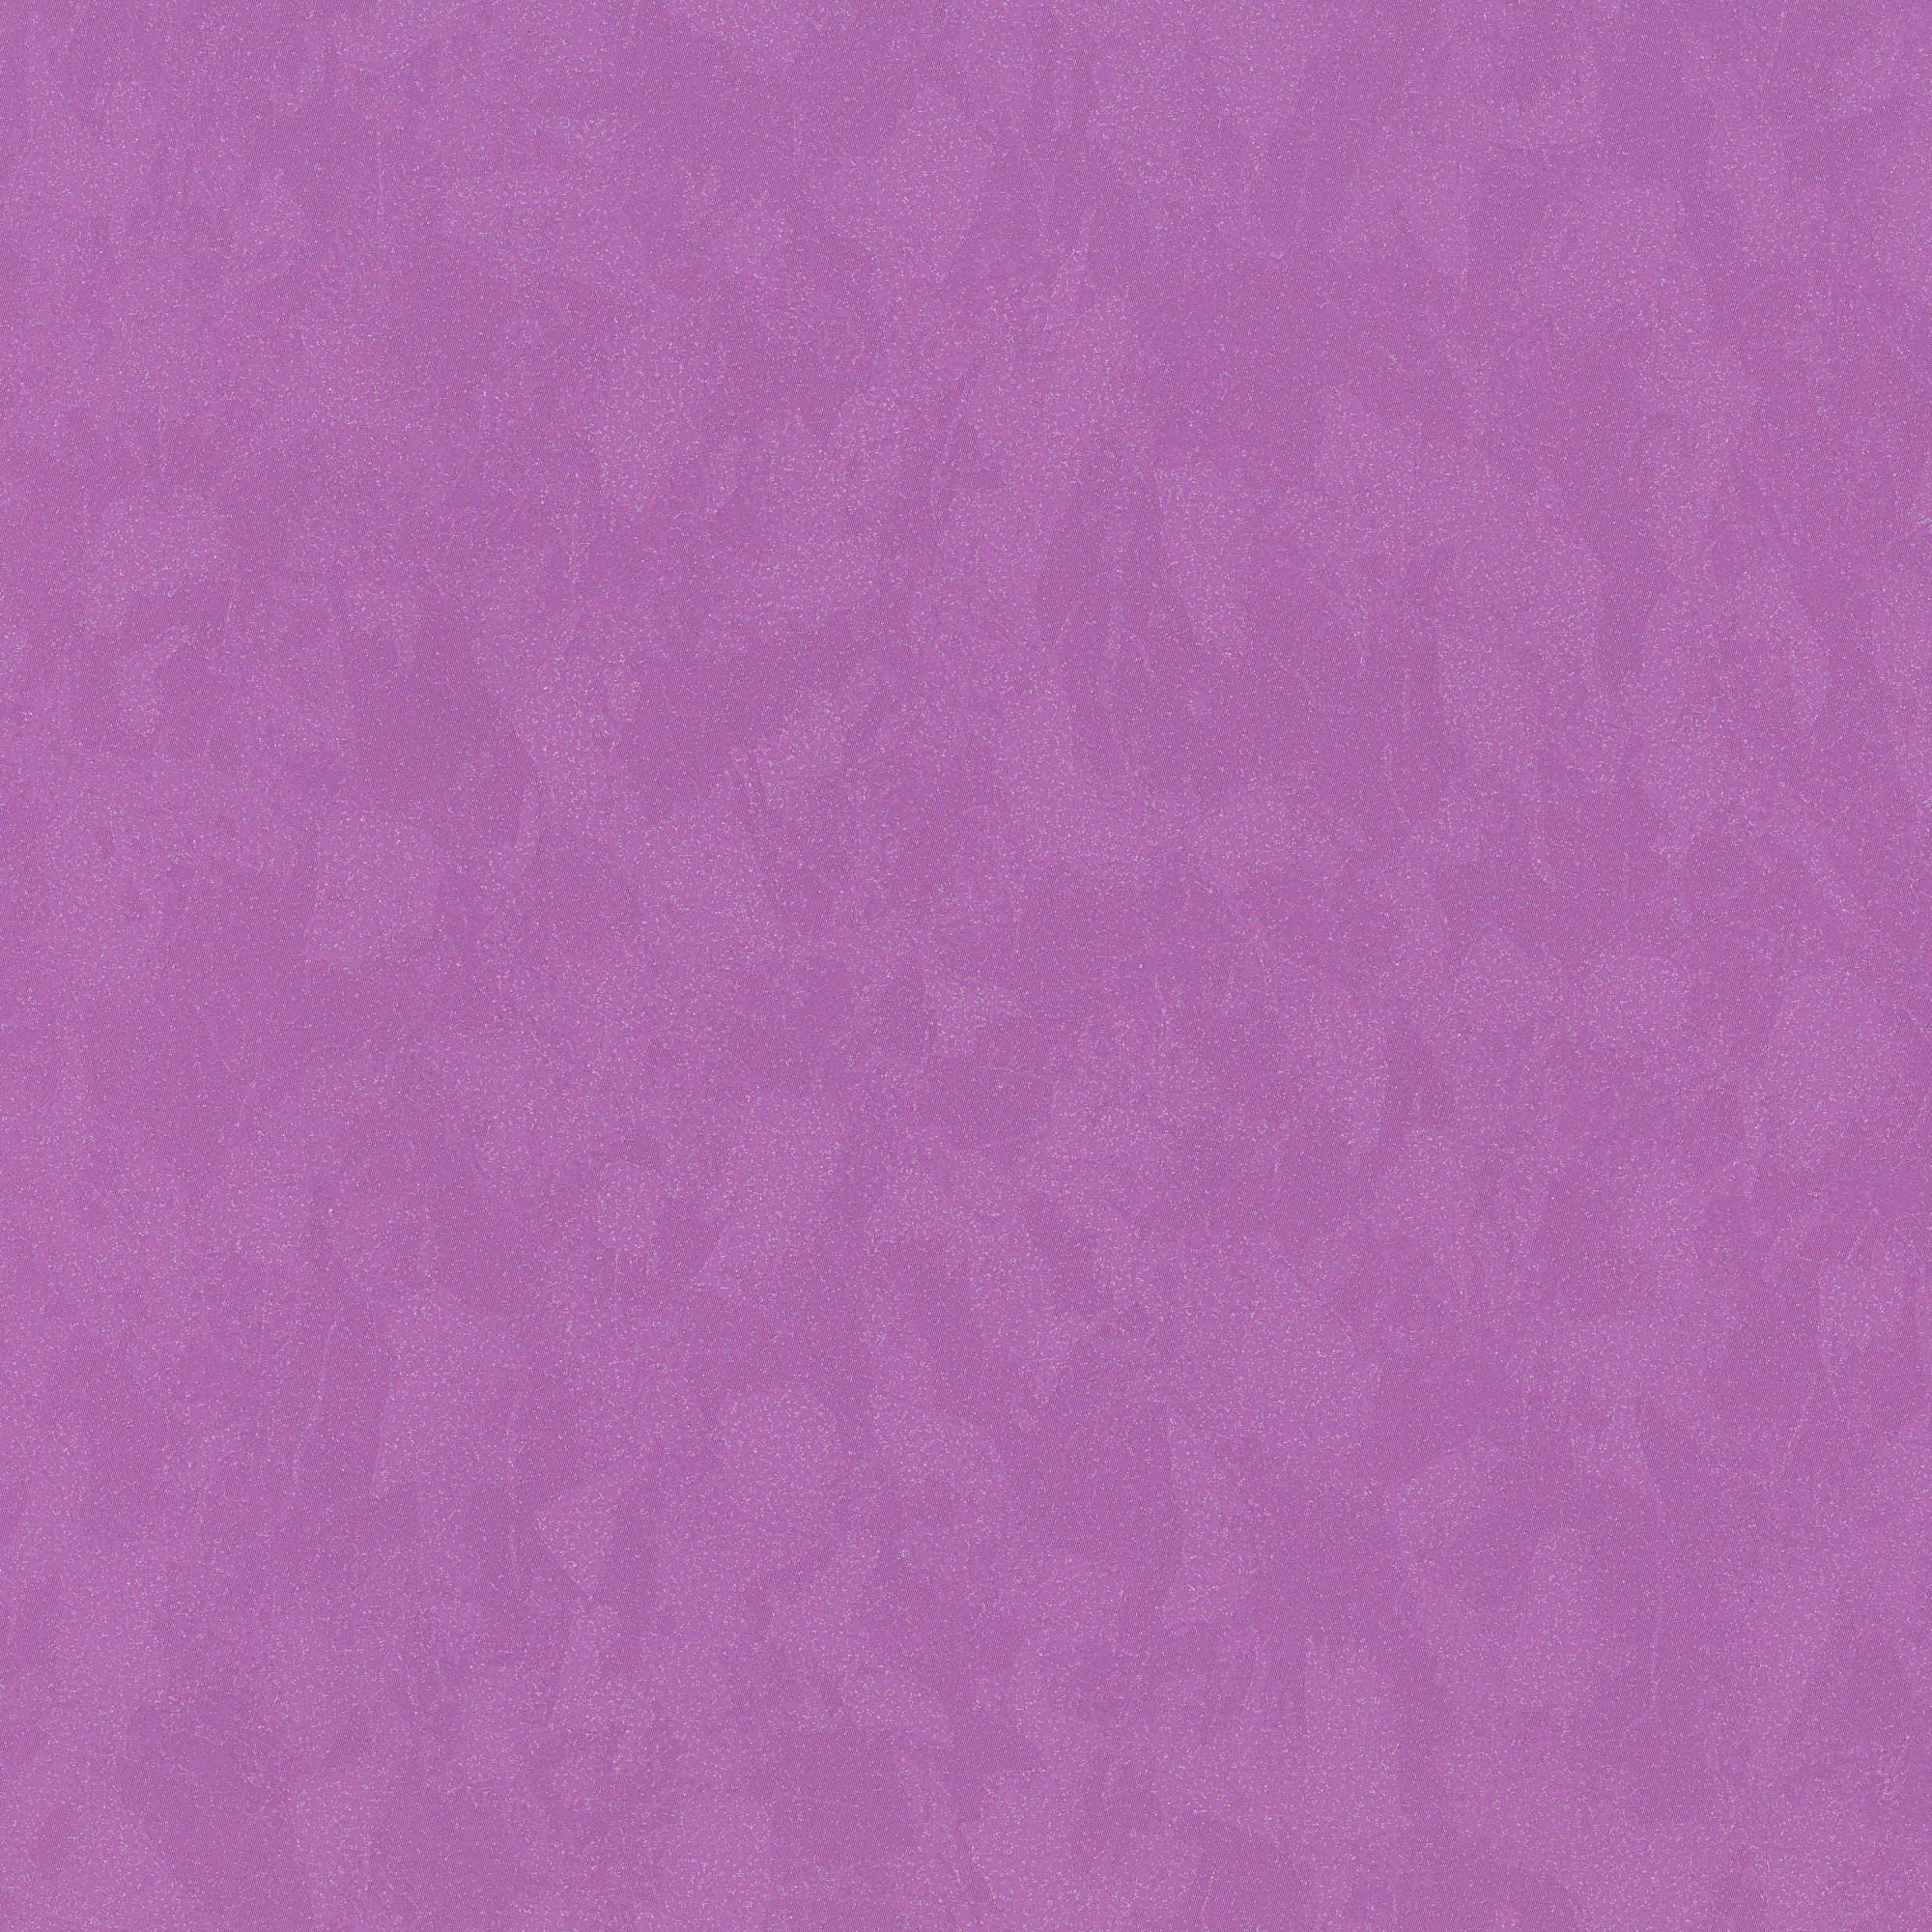 Muster Tapeten Mit Glitzer : Tapete Jackpot Vliestapete 02316-30 0231630 Muster Glitzer violett